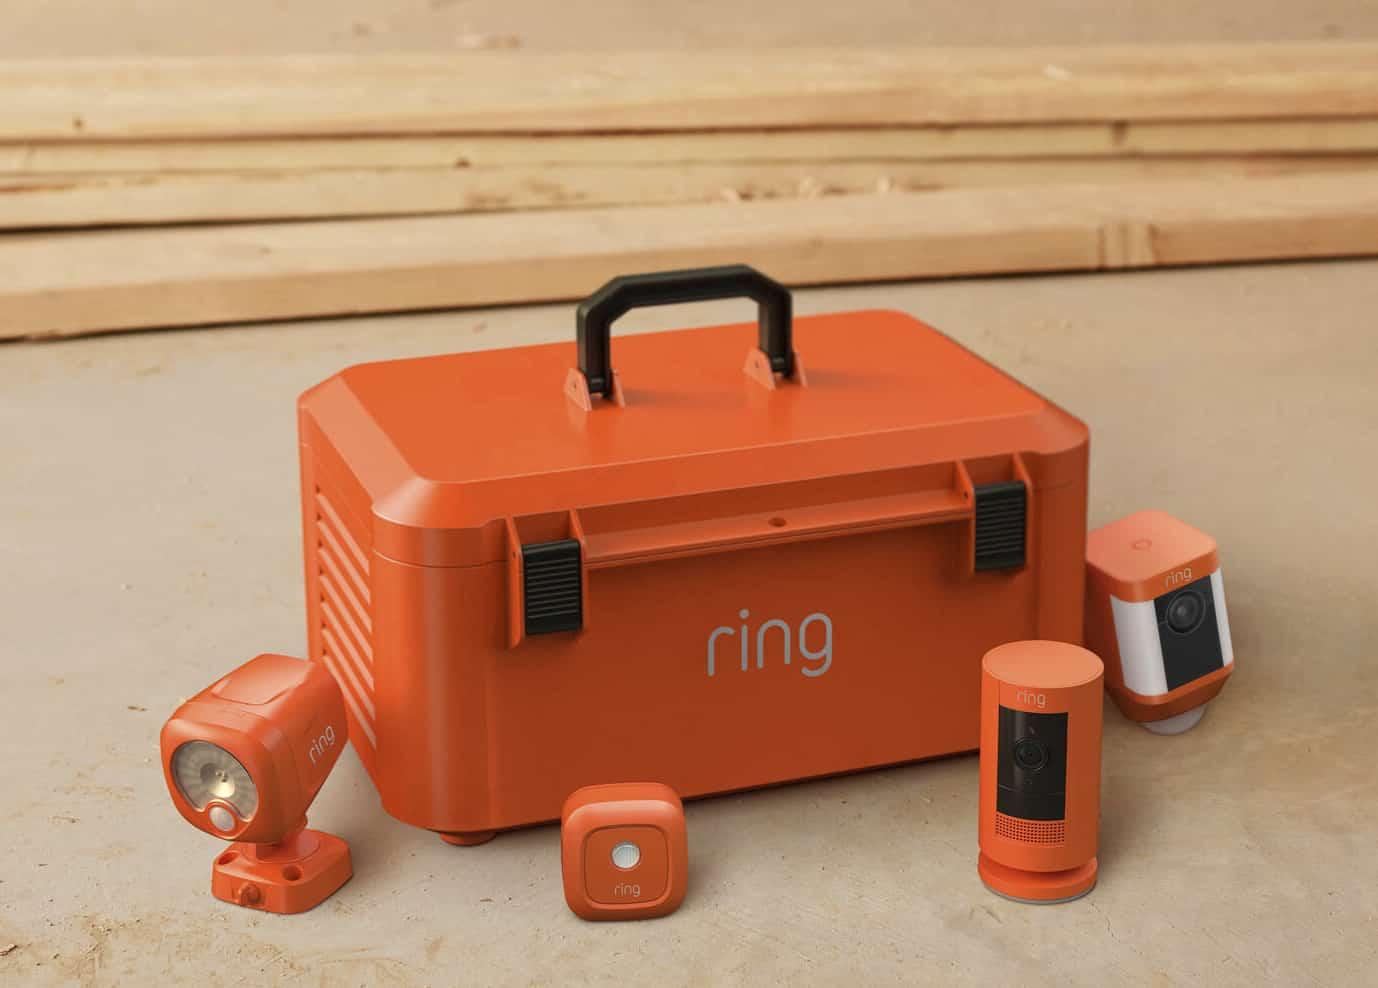 Ring Jobsite Security Kit (Photo: Ring)